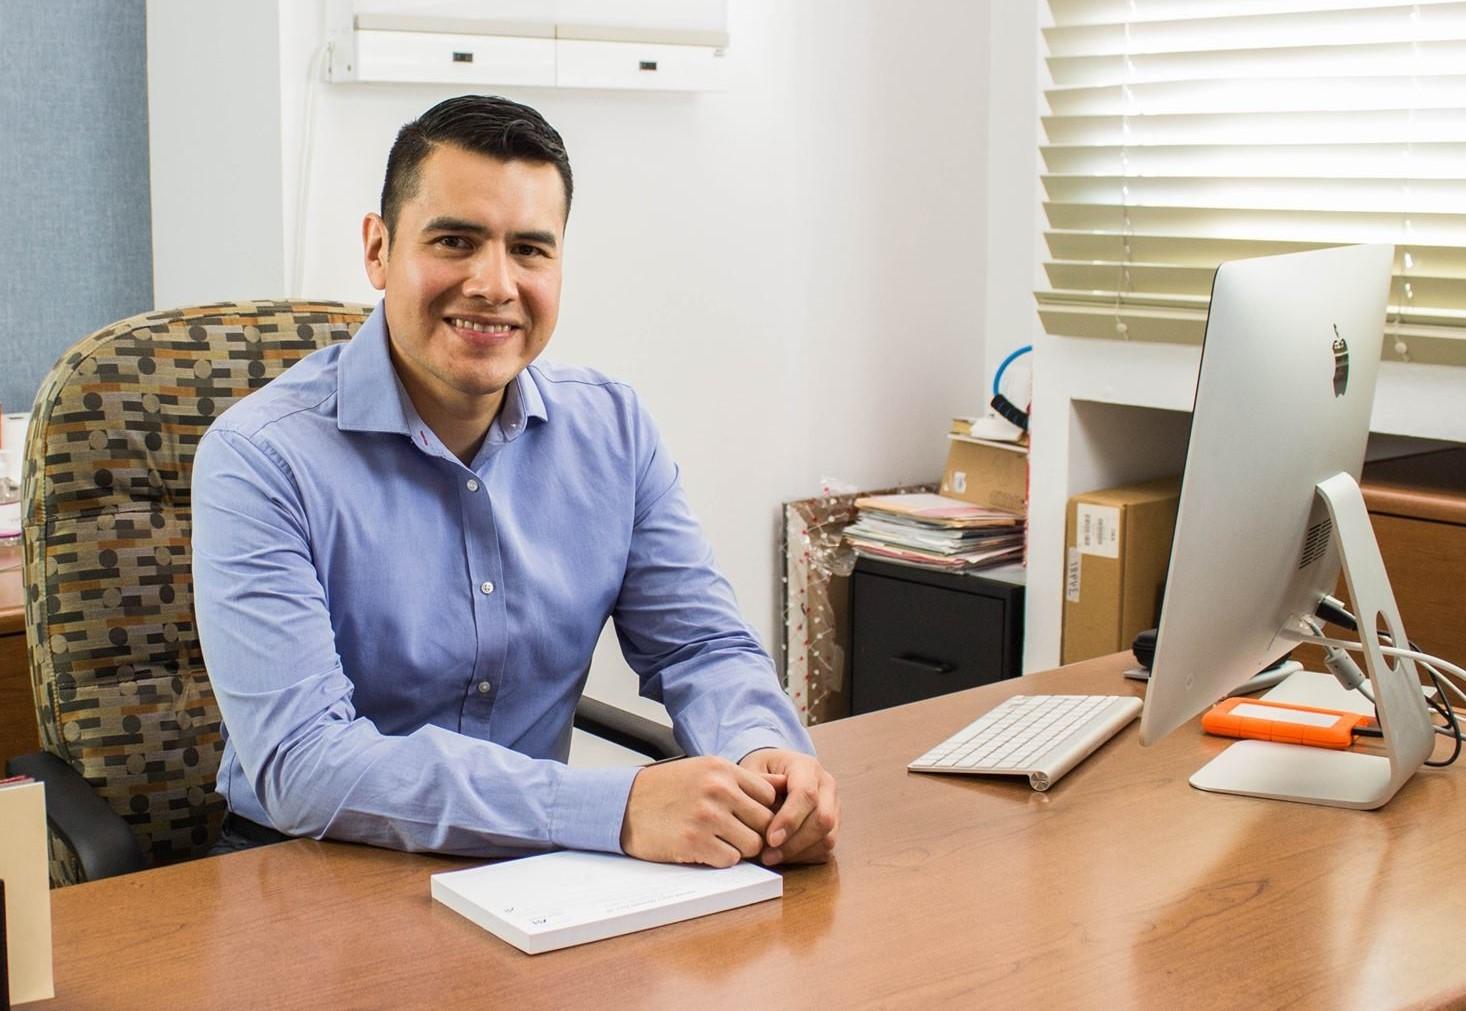 dr. luis santos at desk